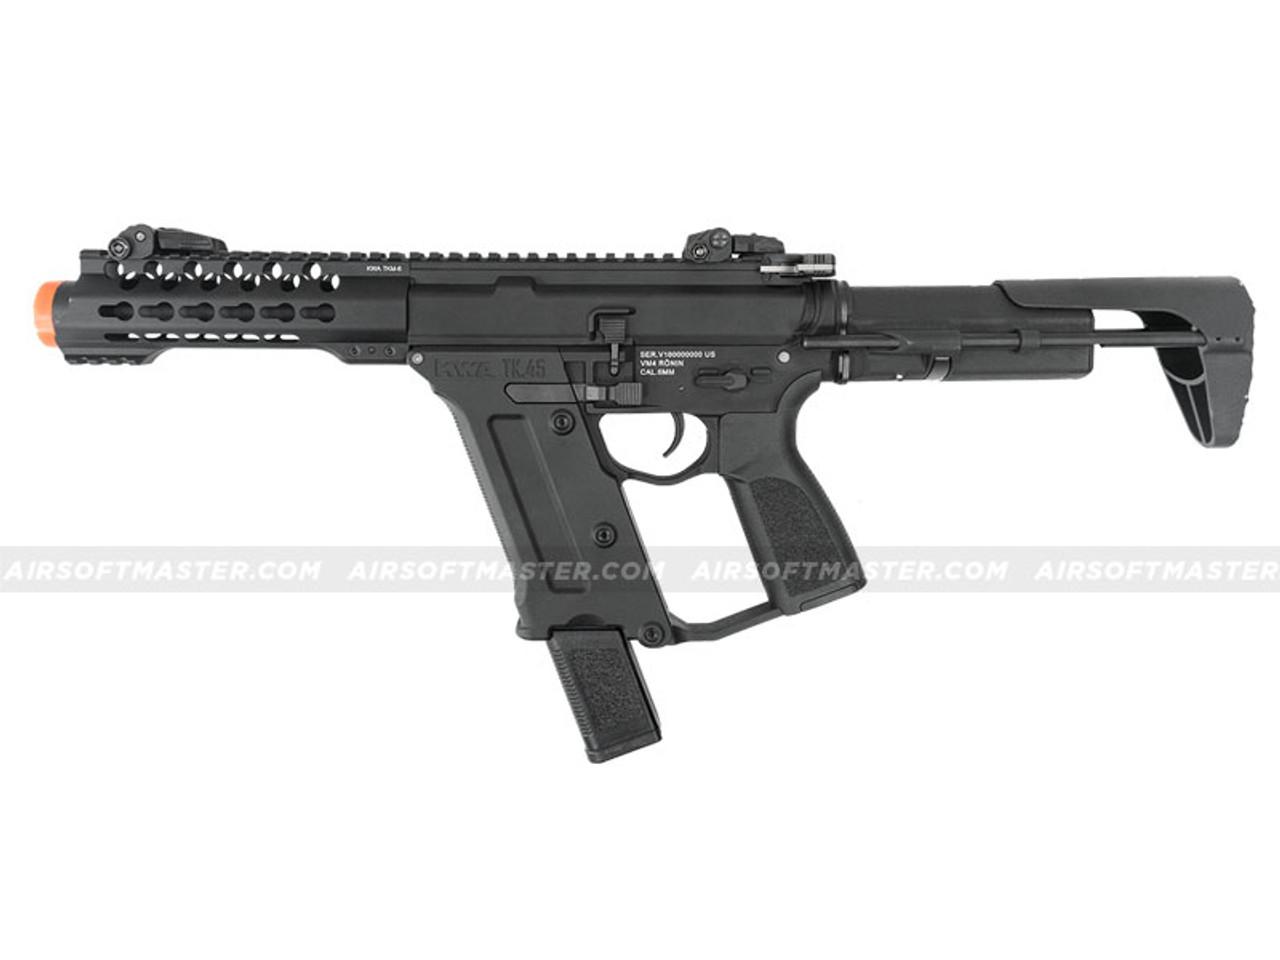 KWA TK45C Adjustable FPS Airsoft Gun